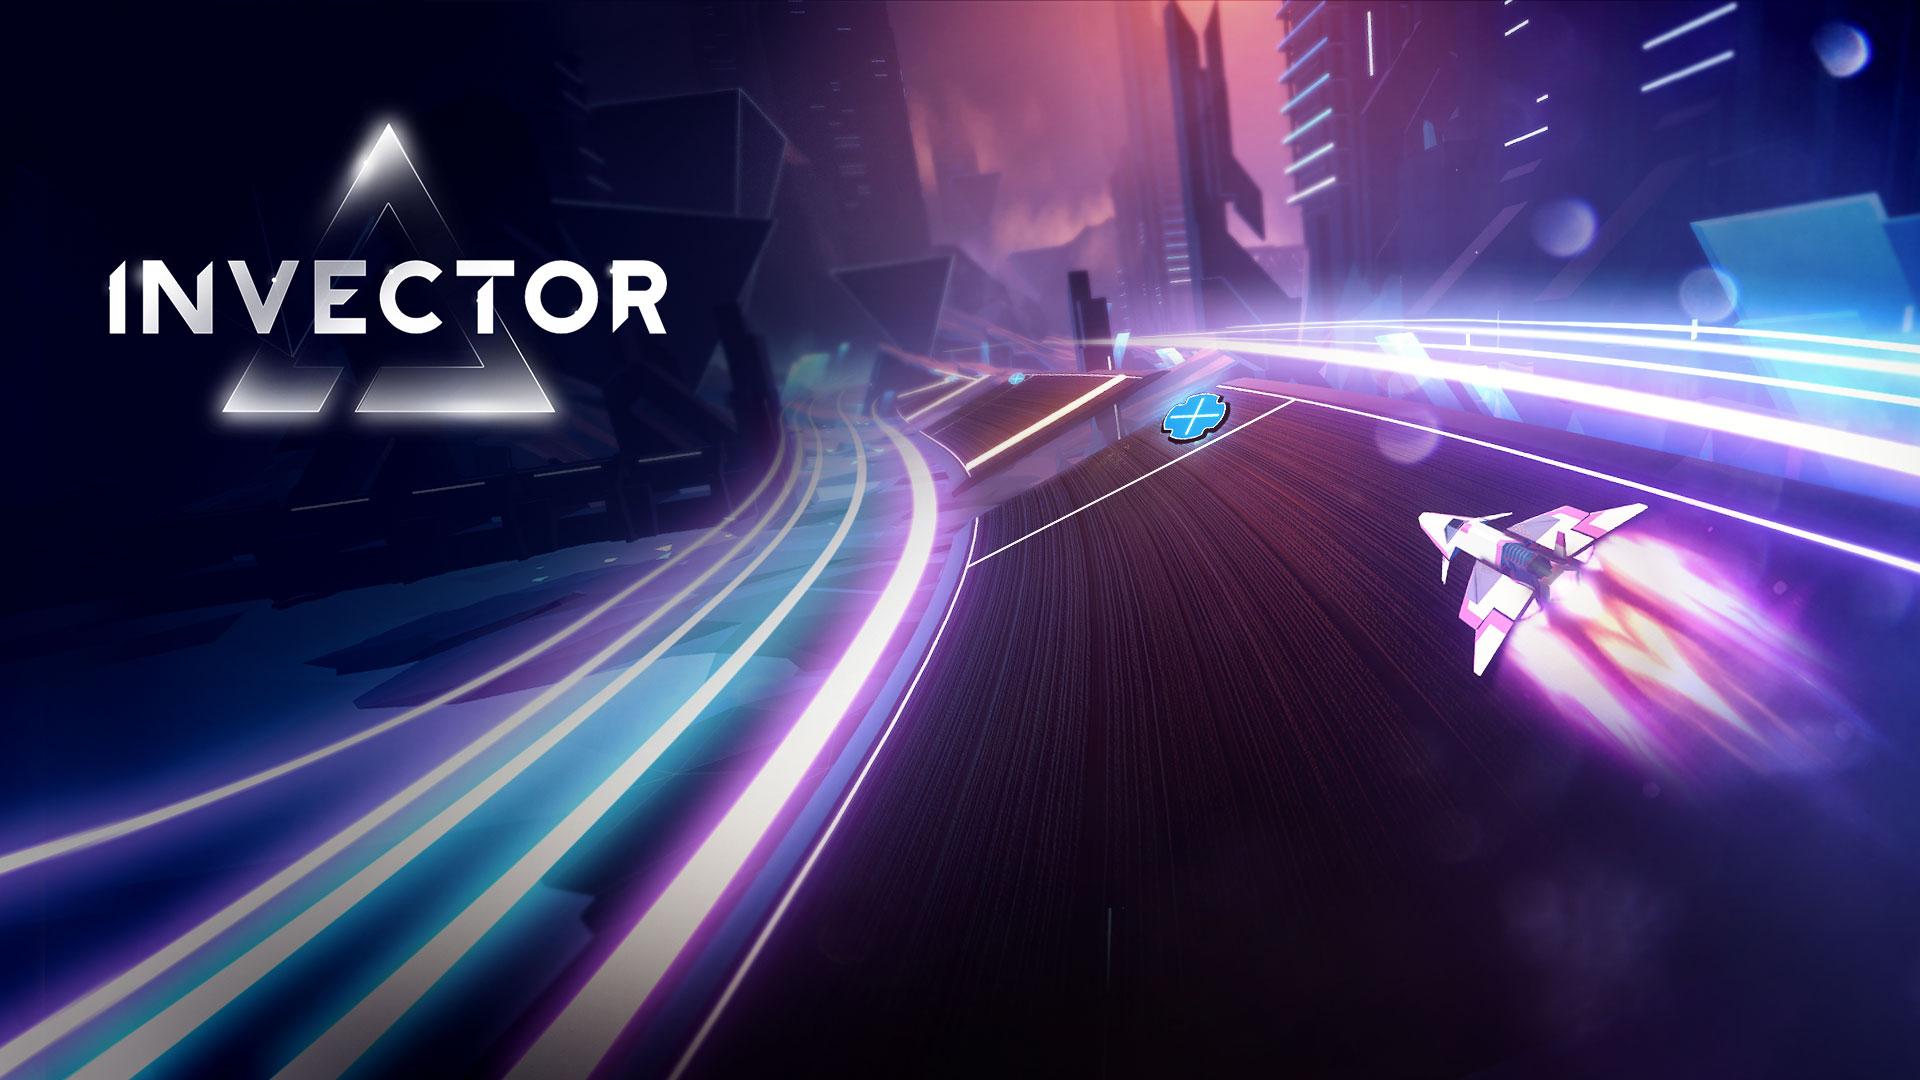 Invector – feat. Avicii